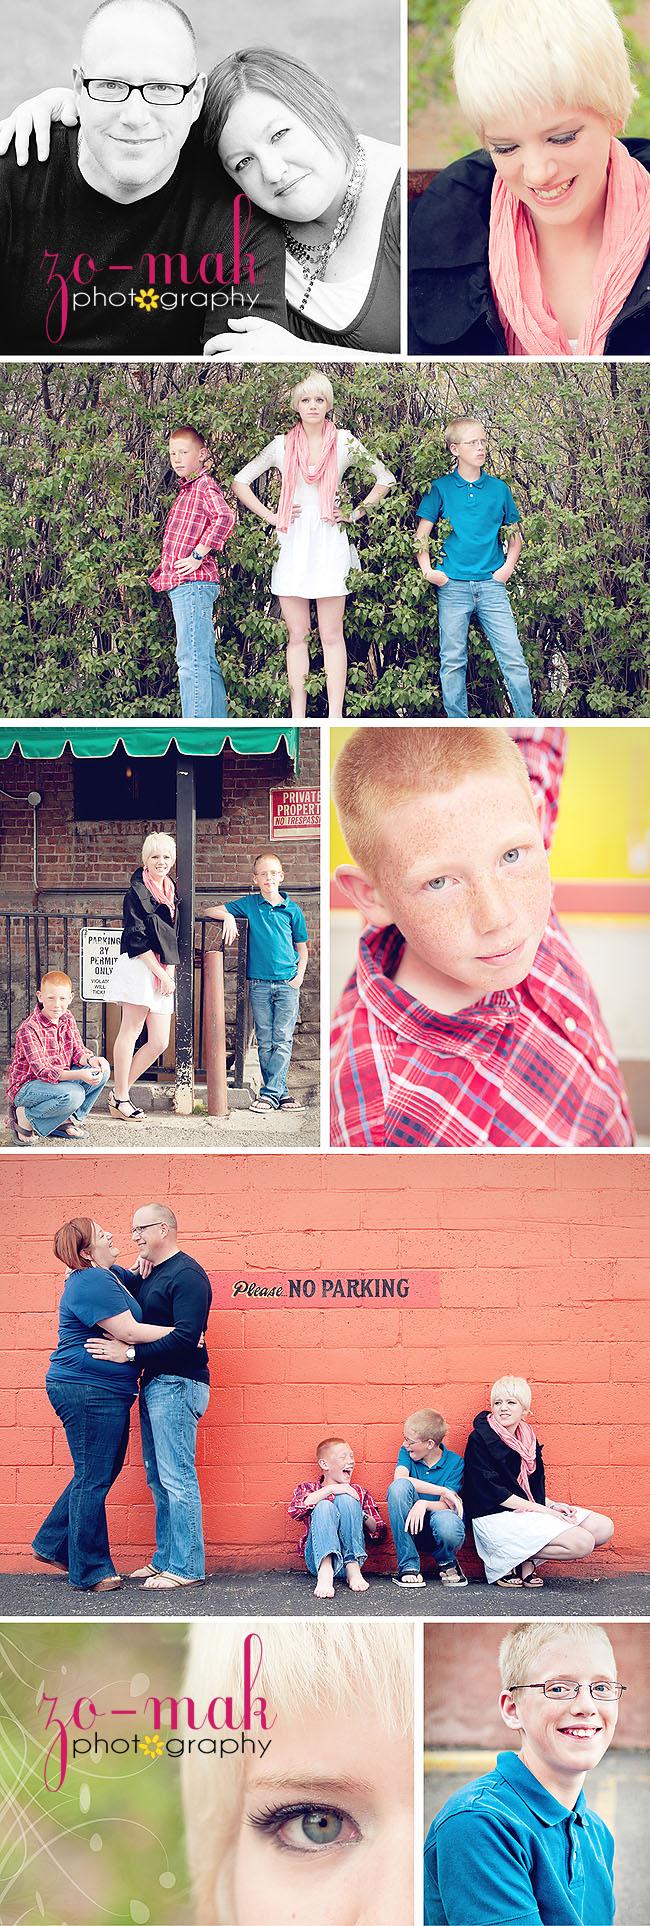 kringlie blog collage